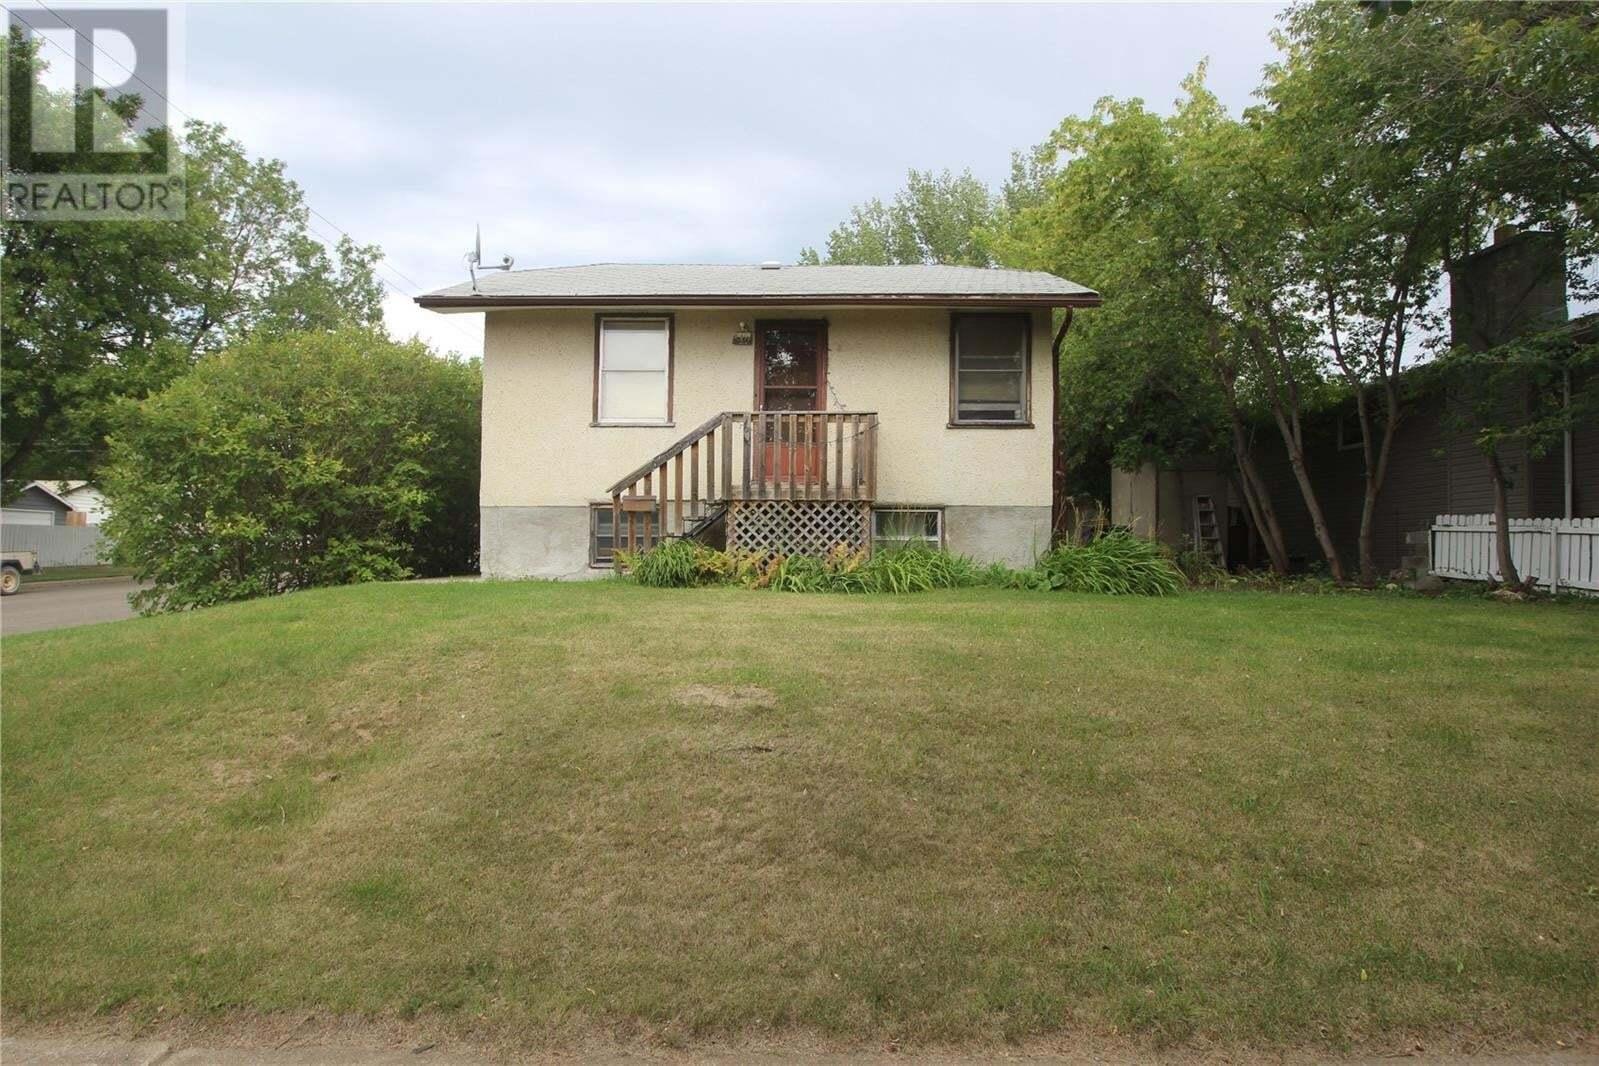 House for sale at 1540 H Ave N Saskatoon Saskatchewan - MLS: SK821962